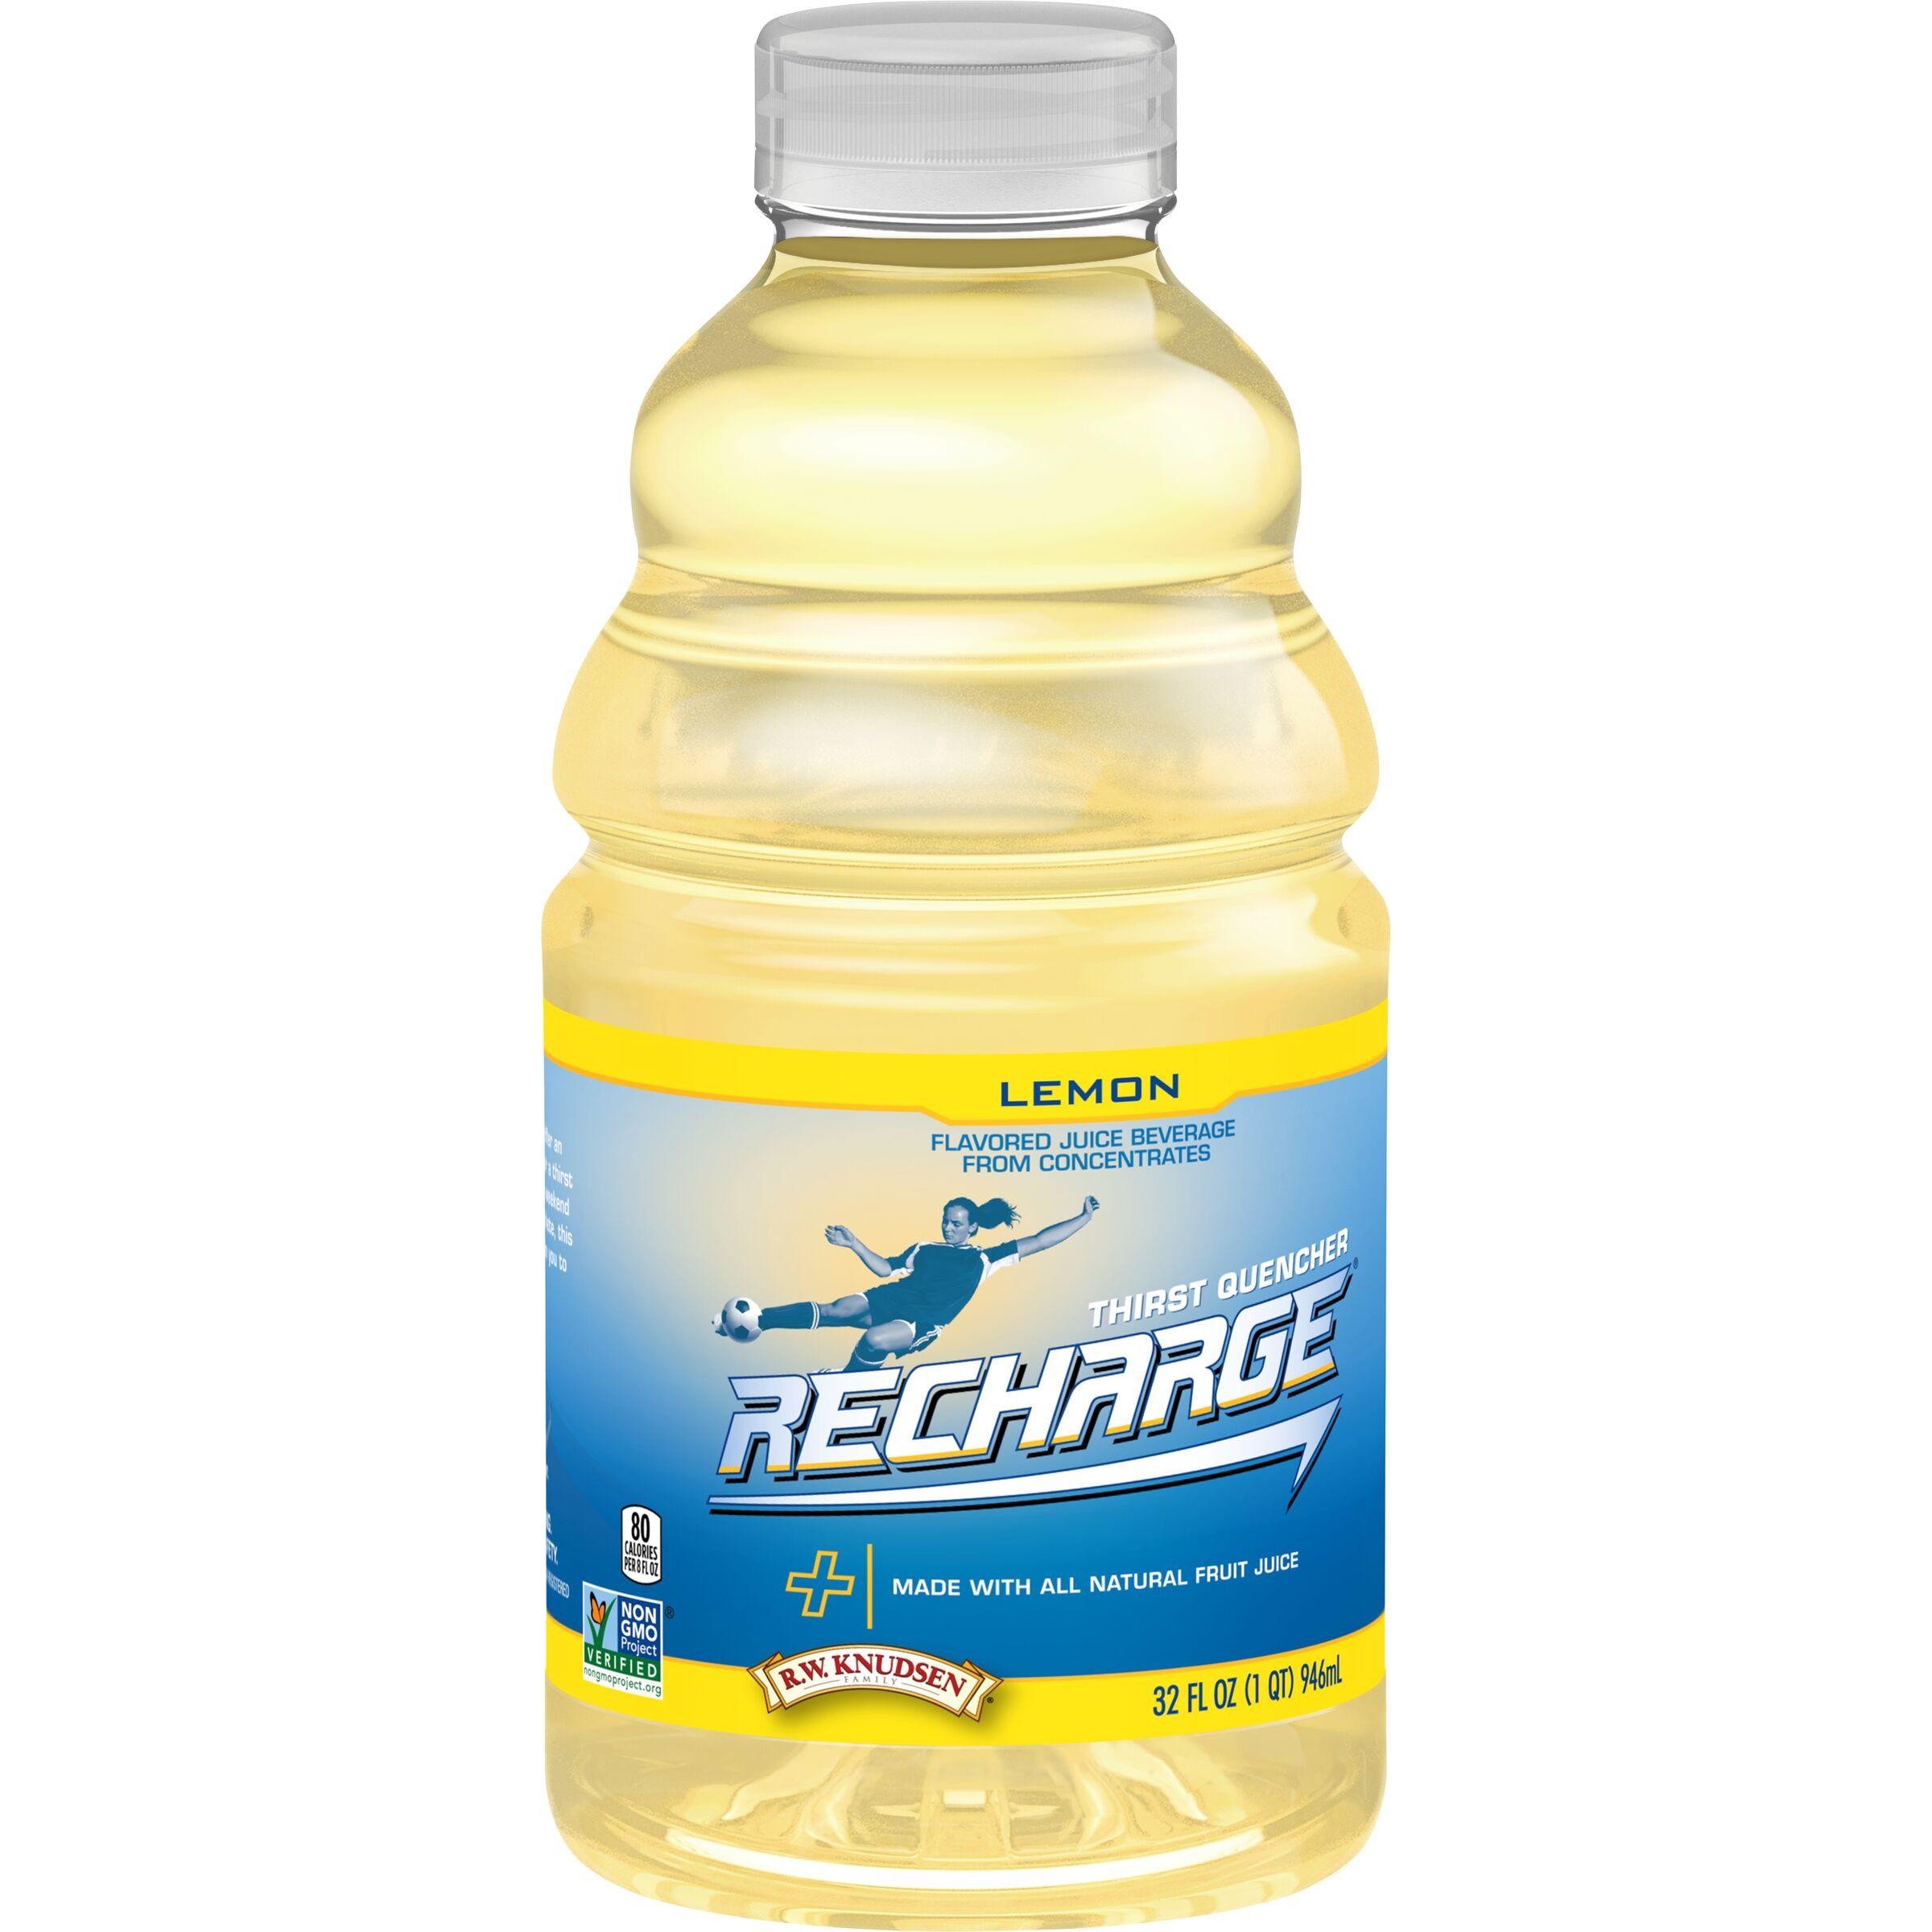 R.W. Knudsen Family Recharge Lemon Sports Drink